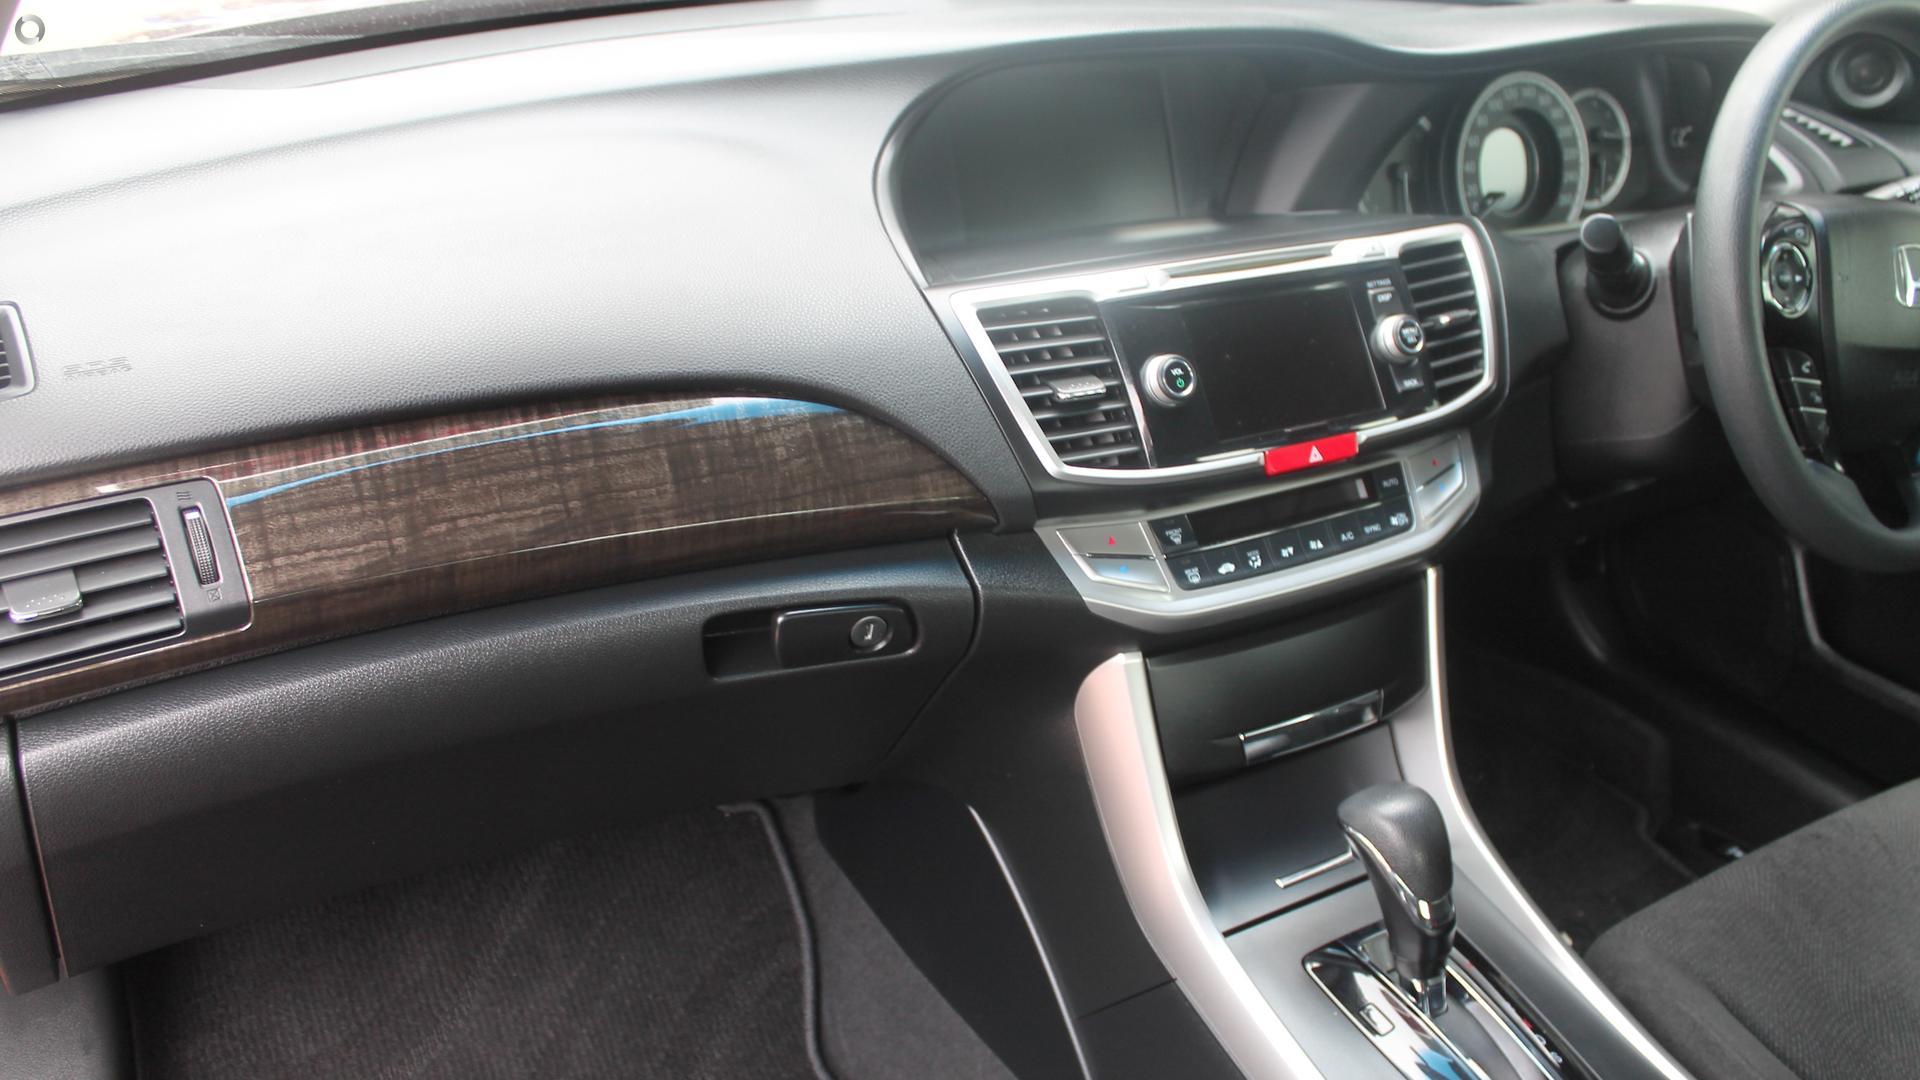 2013 Honda Accord VTi 9th Gen